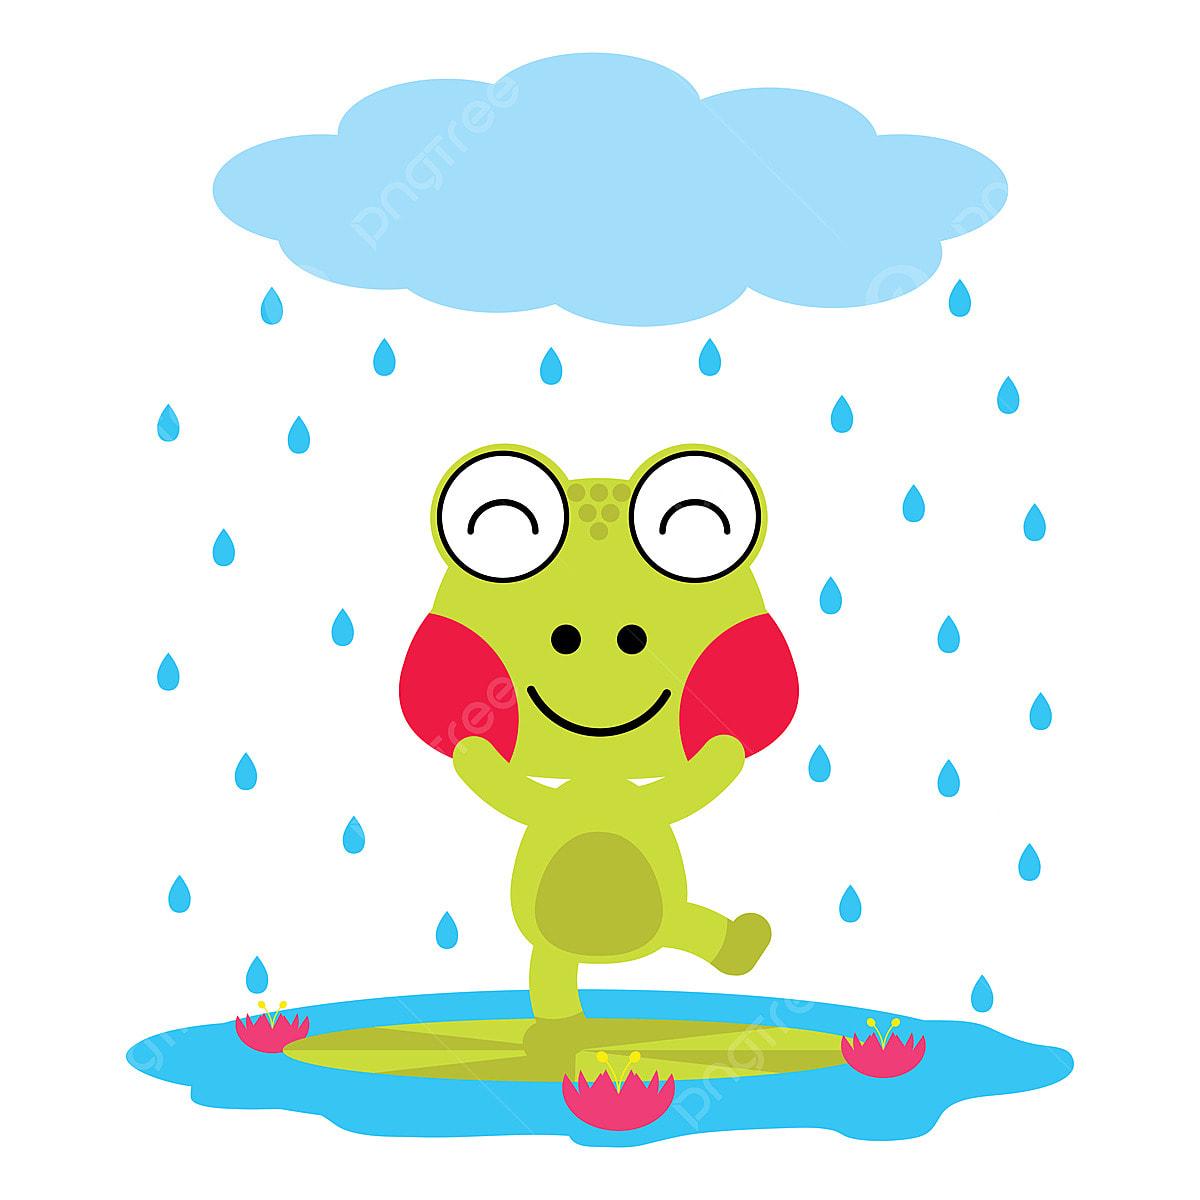 Katak Lucu Bermain Pada Ilustrasi Kartun Hujan Untuk Kanak